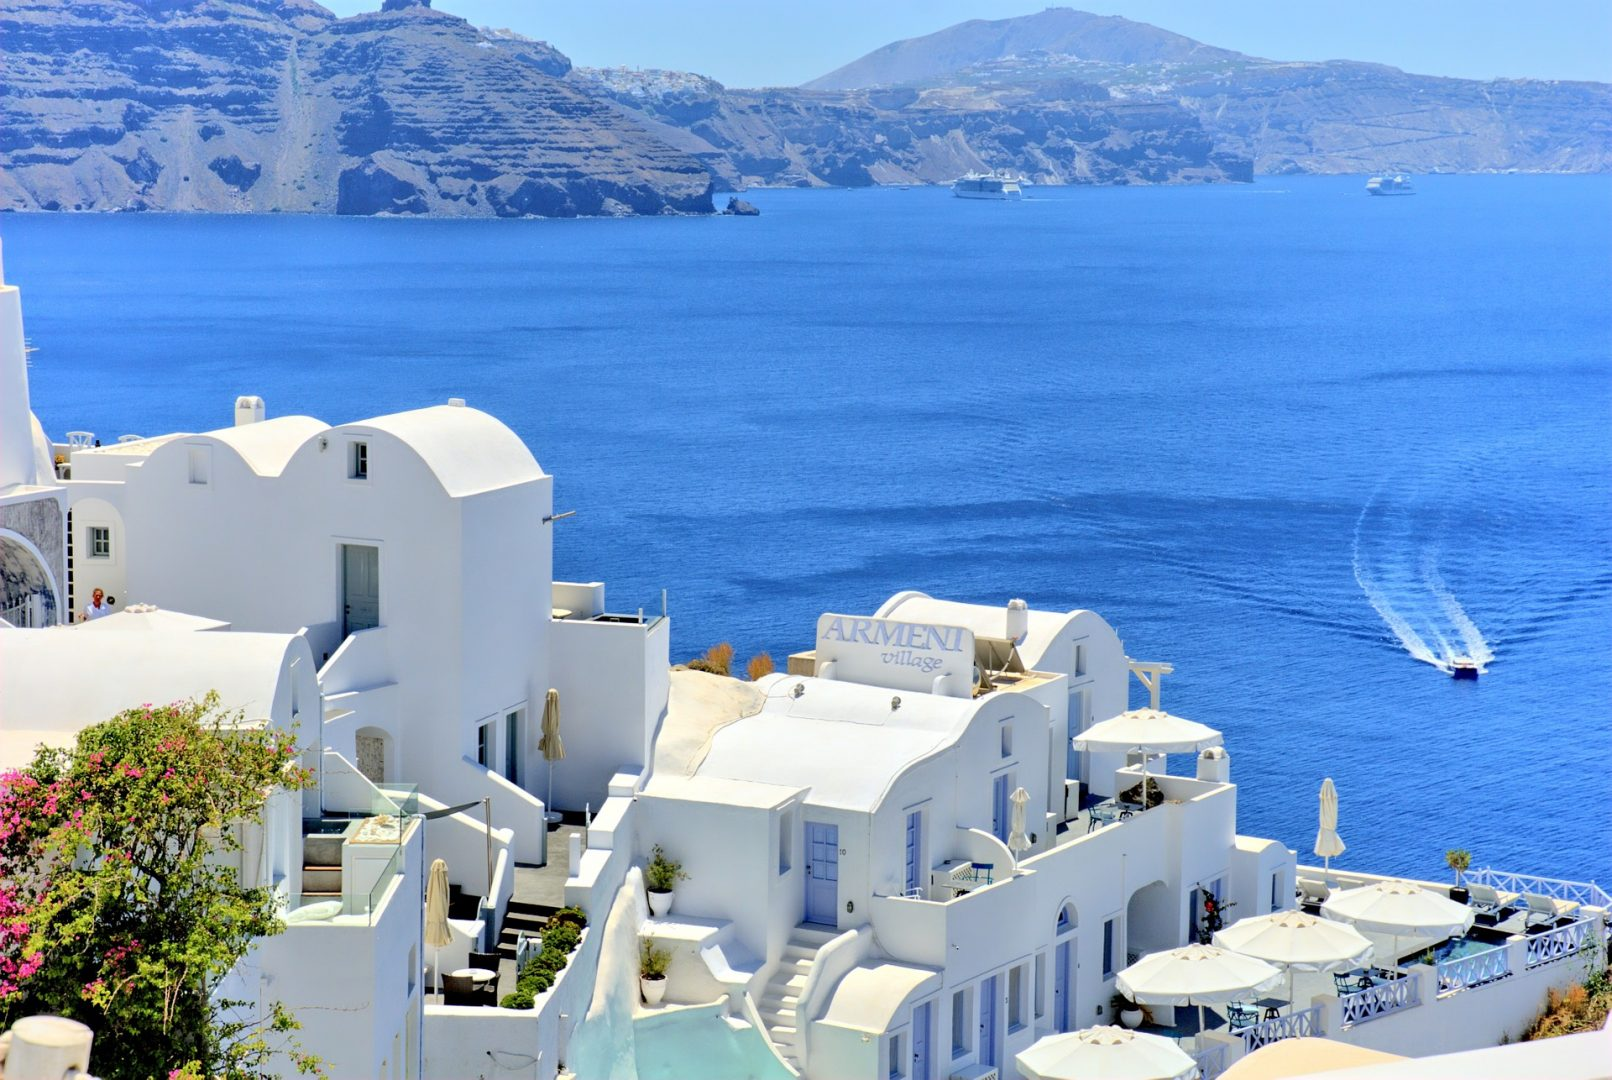 Wyjazd na Santorini